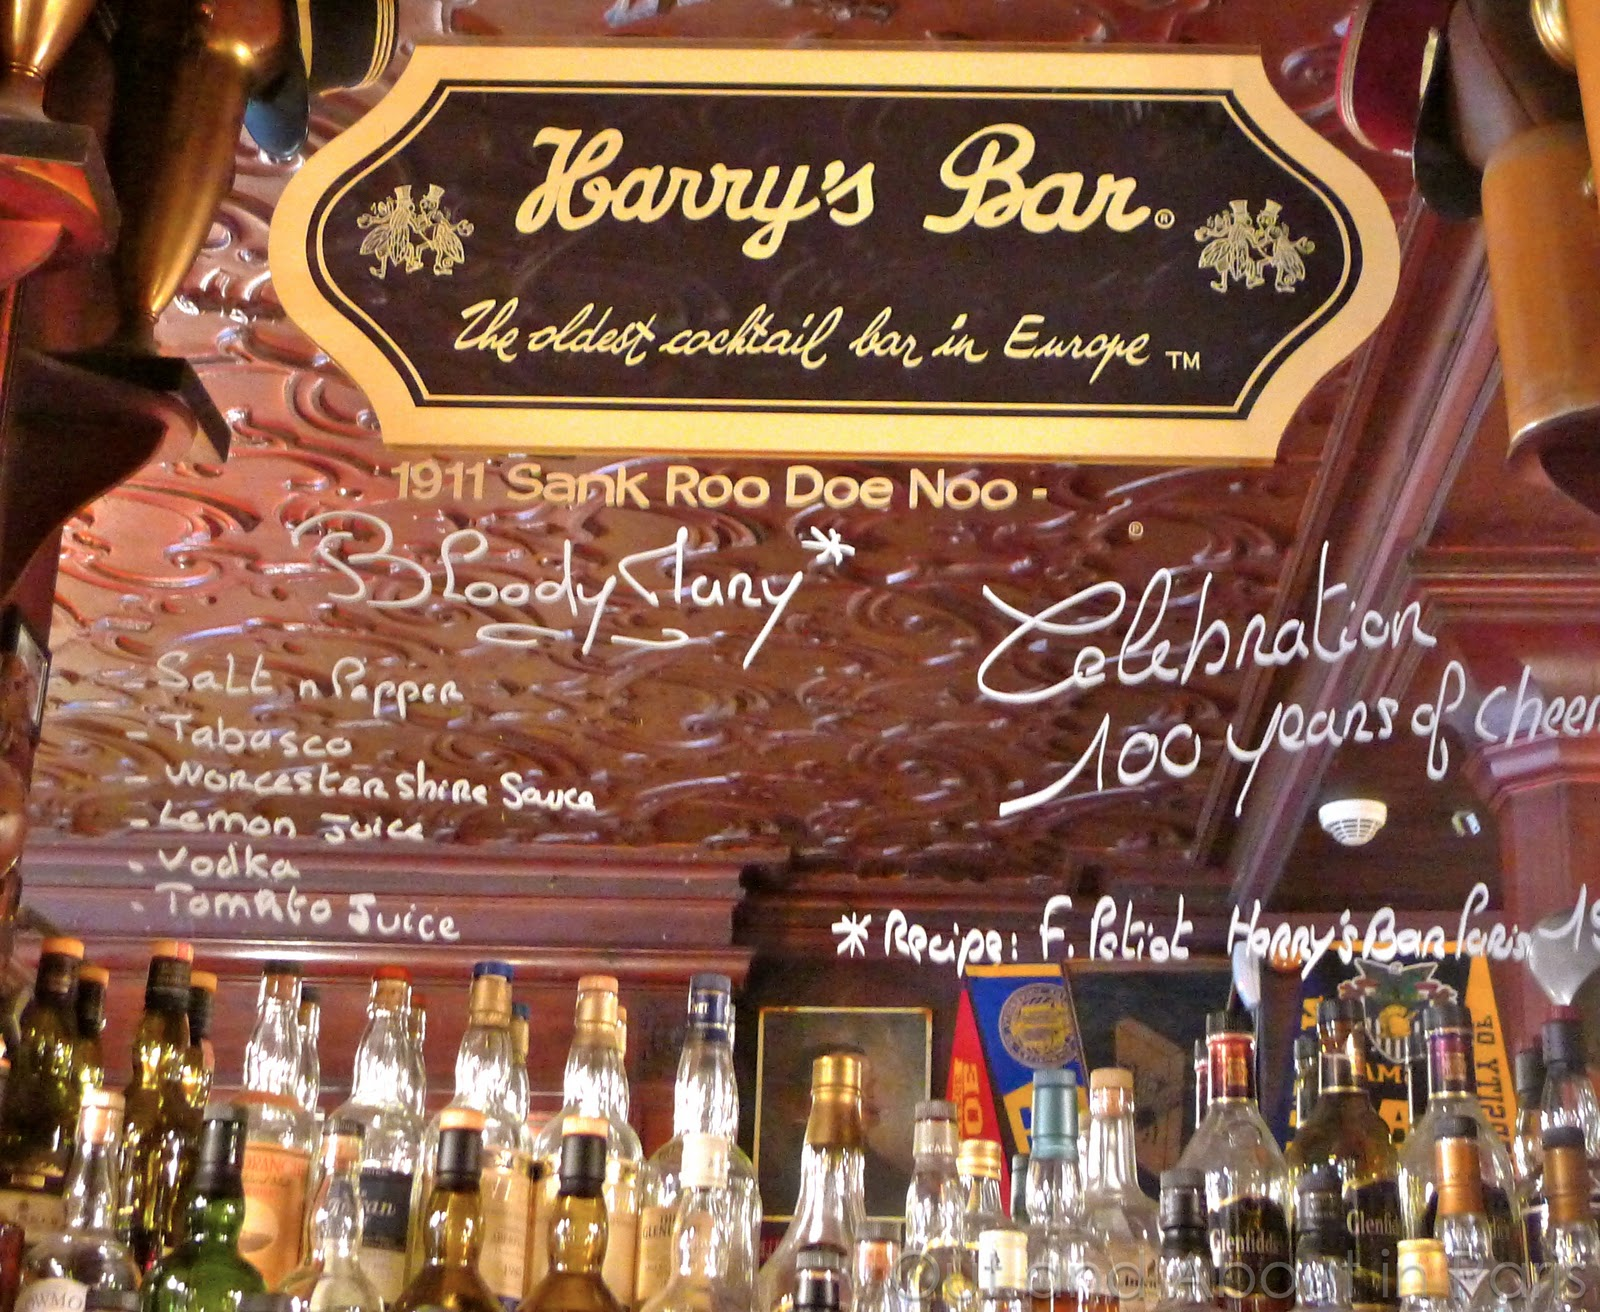 Резултат с изображение за Bloody Mary harris bar paris